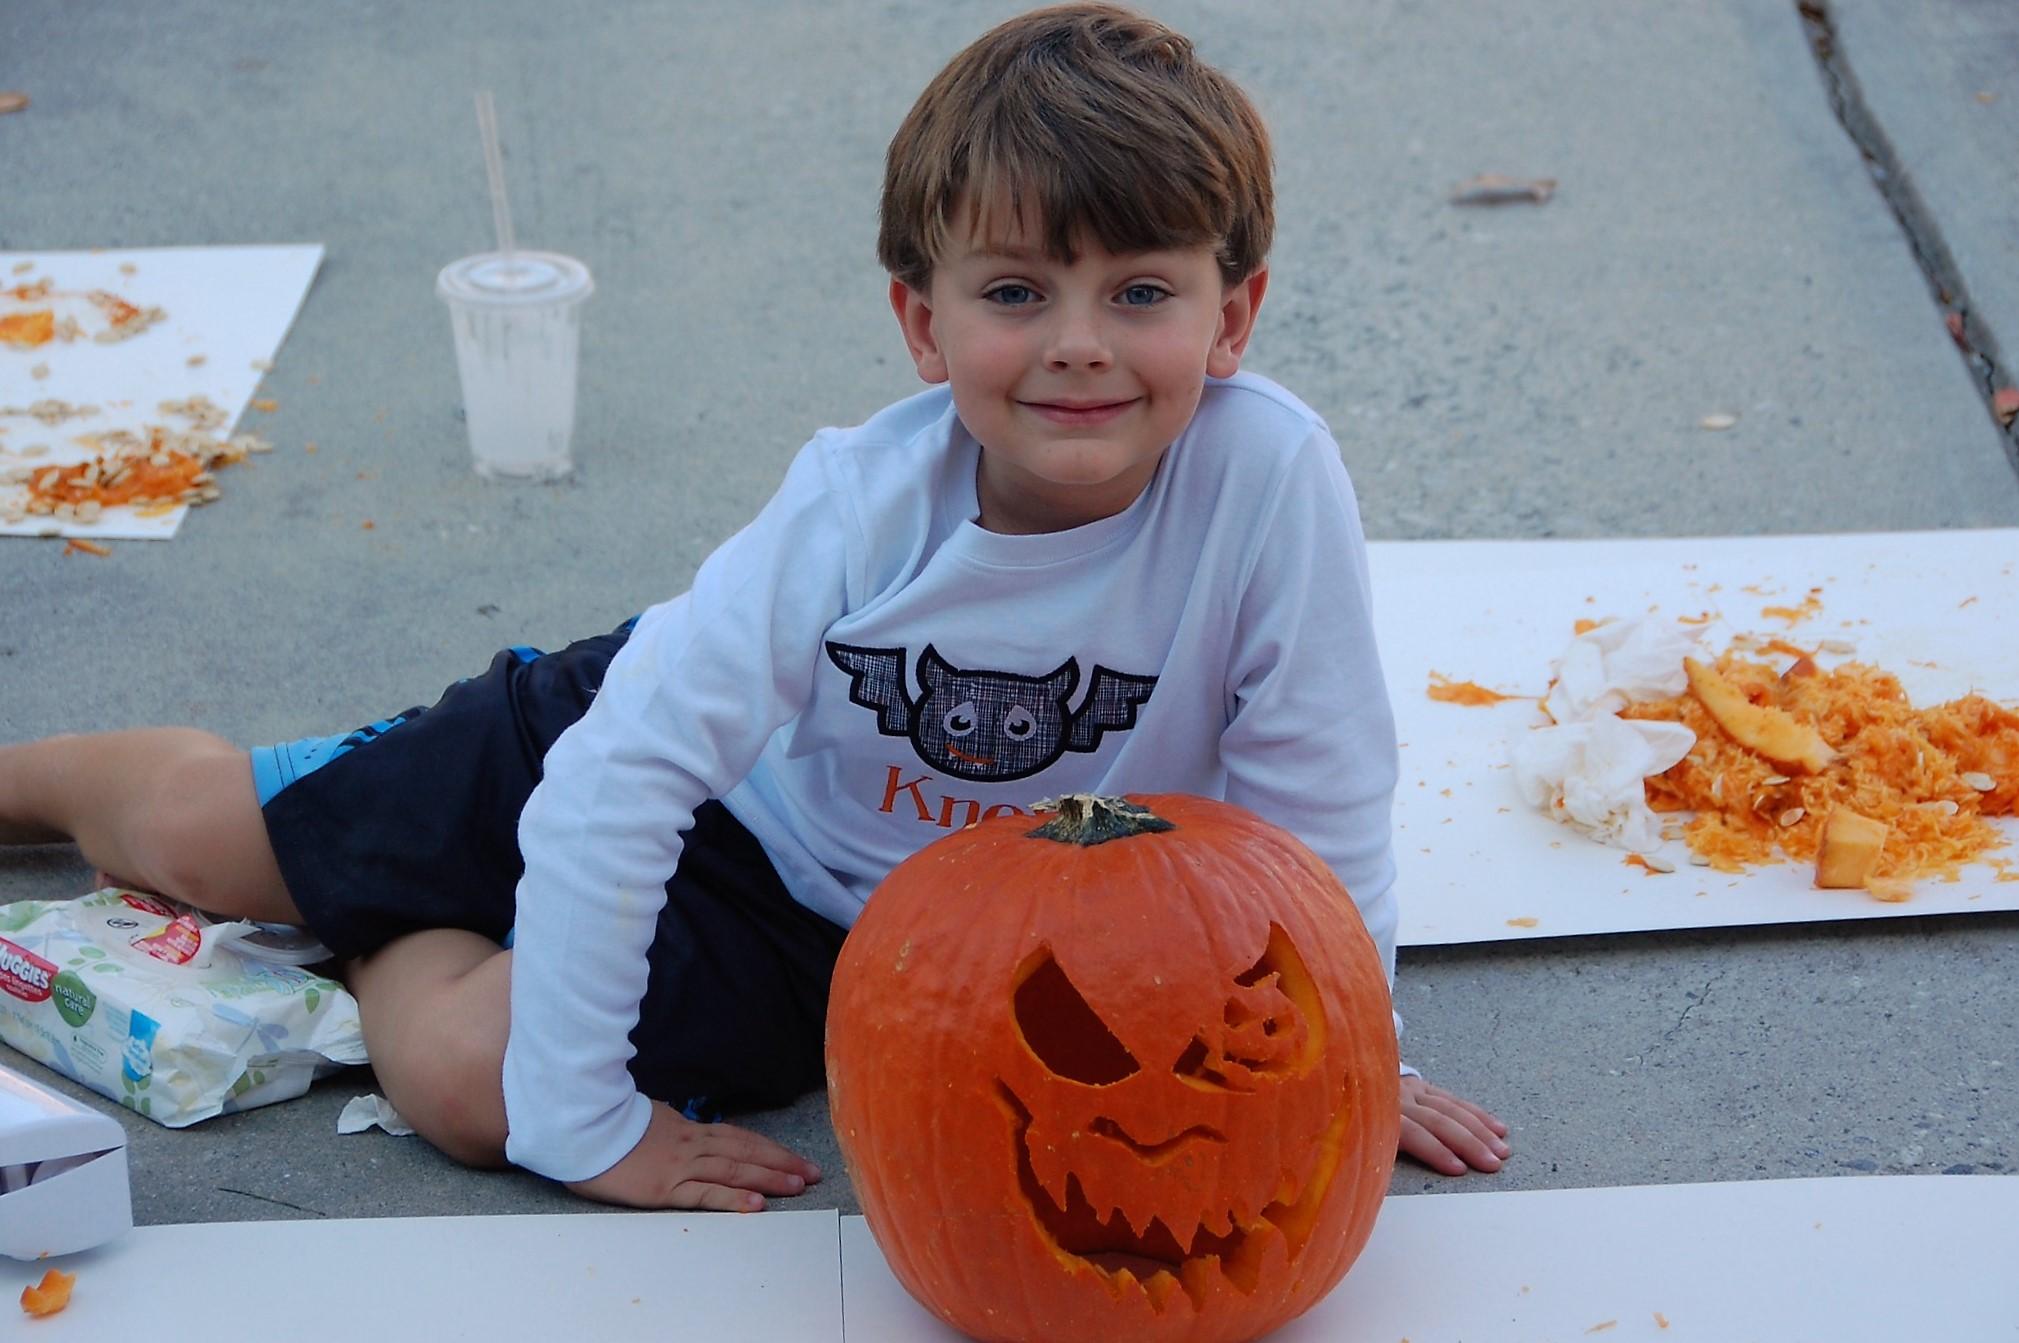 Knox Bishop carving a pumpkin for Halloween